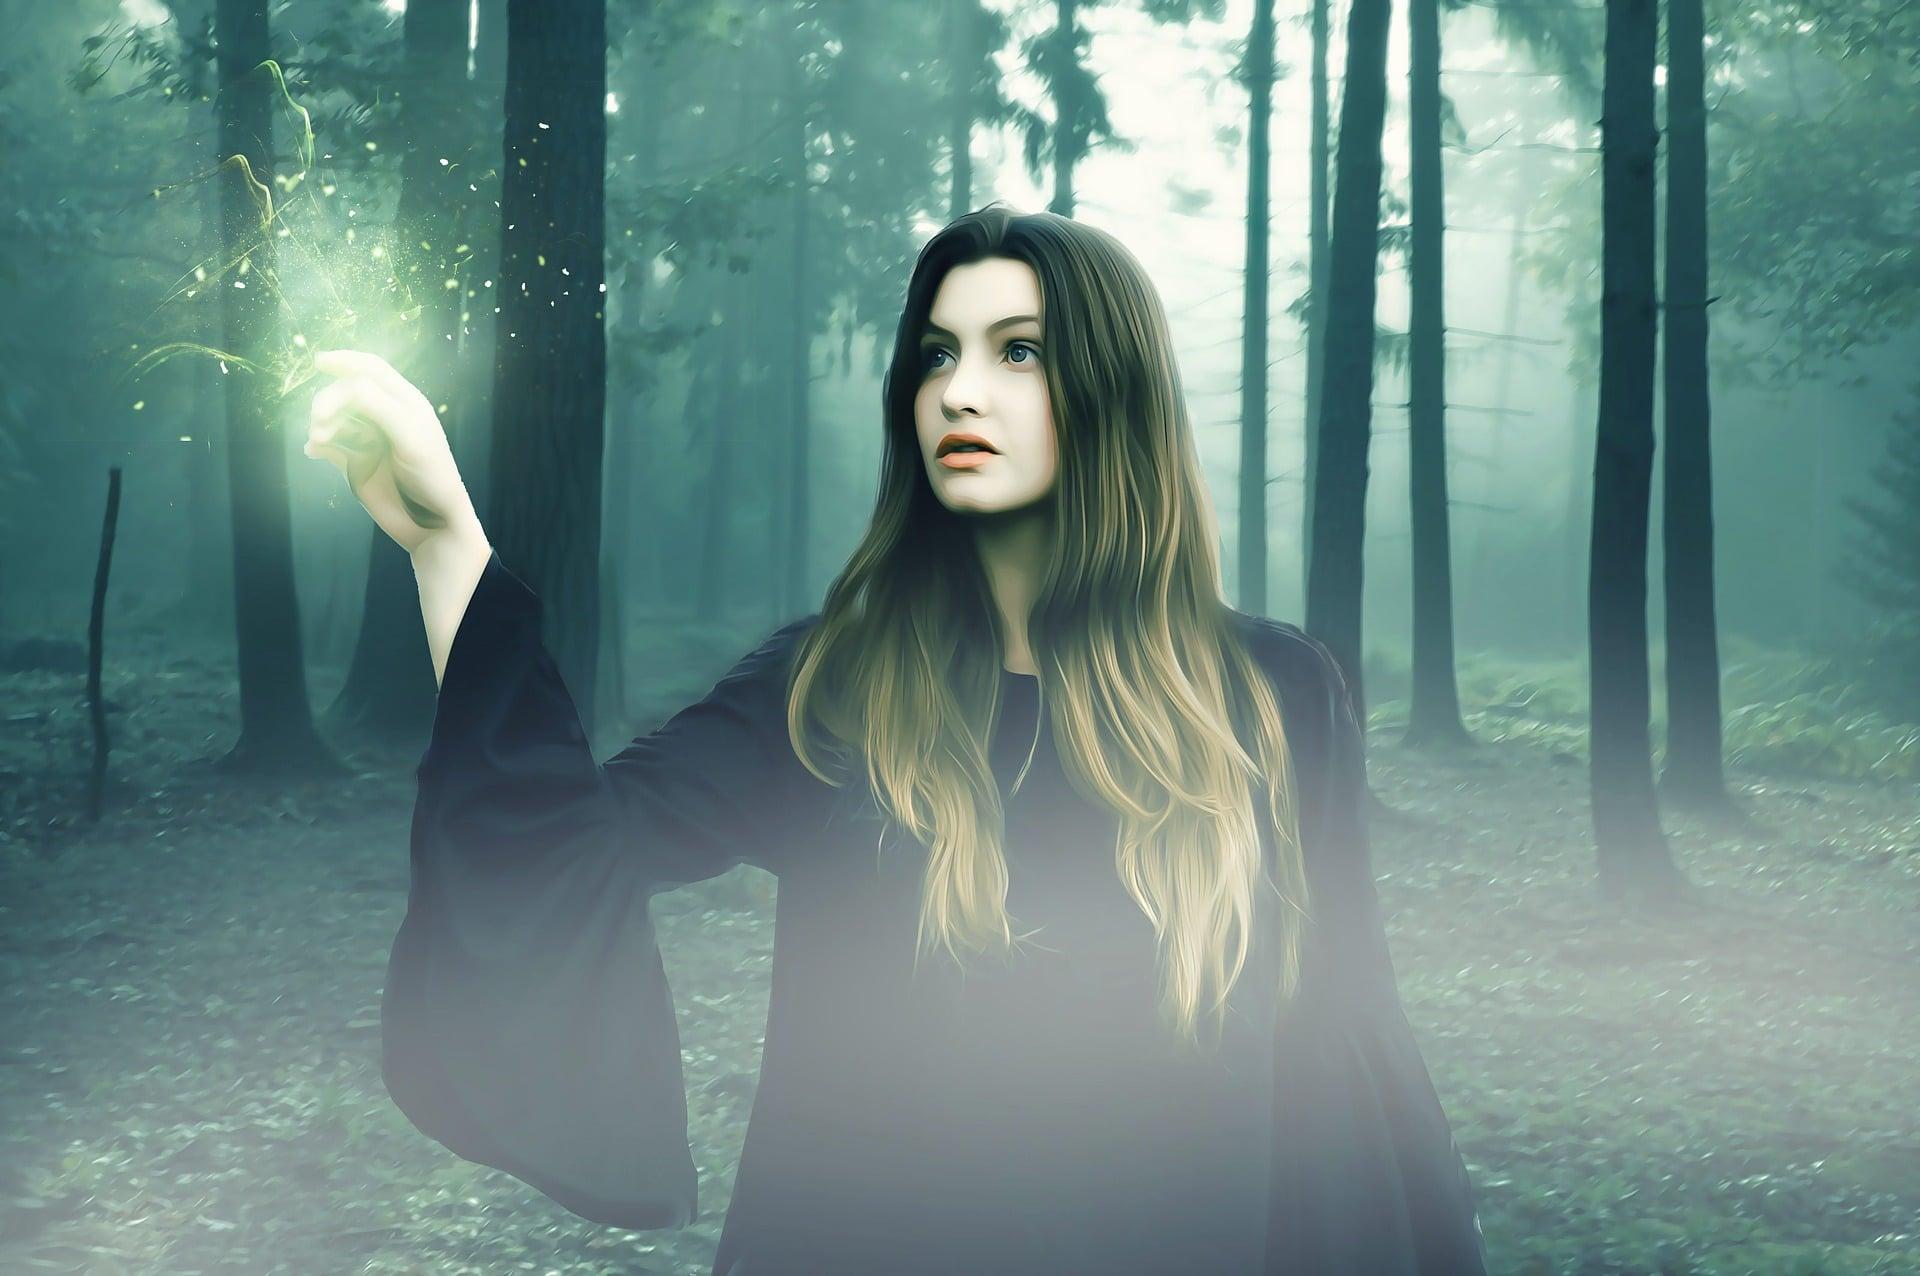 como desfazer magia negra para separar casal